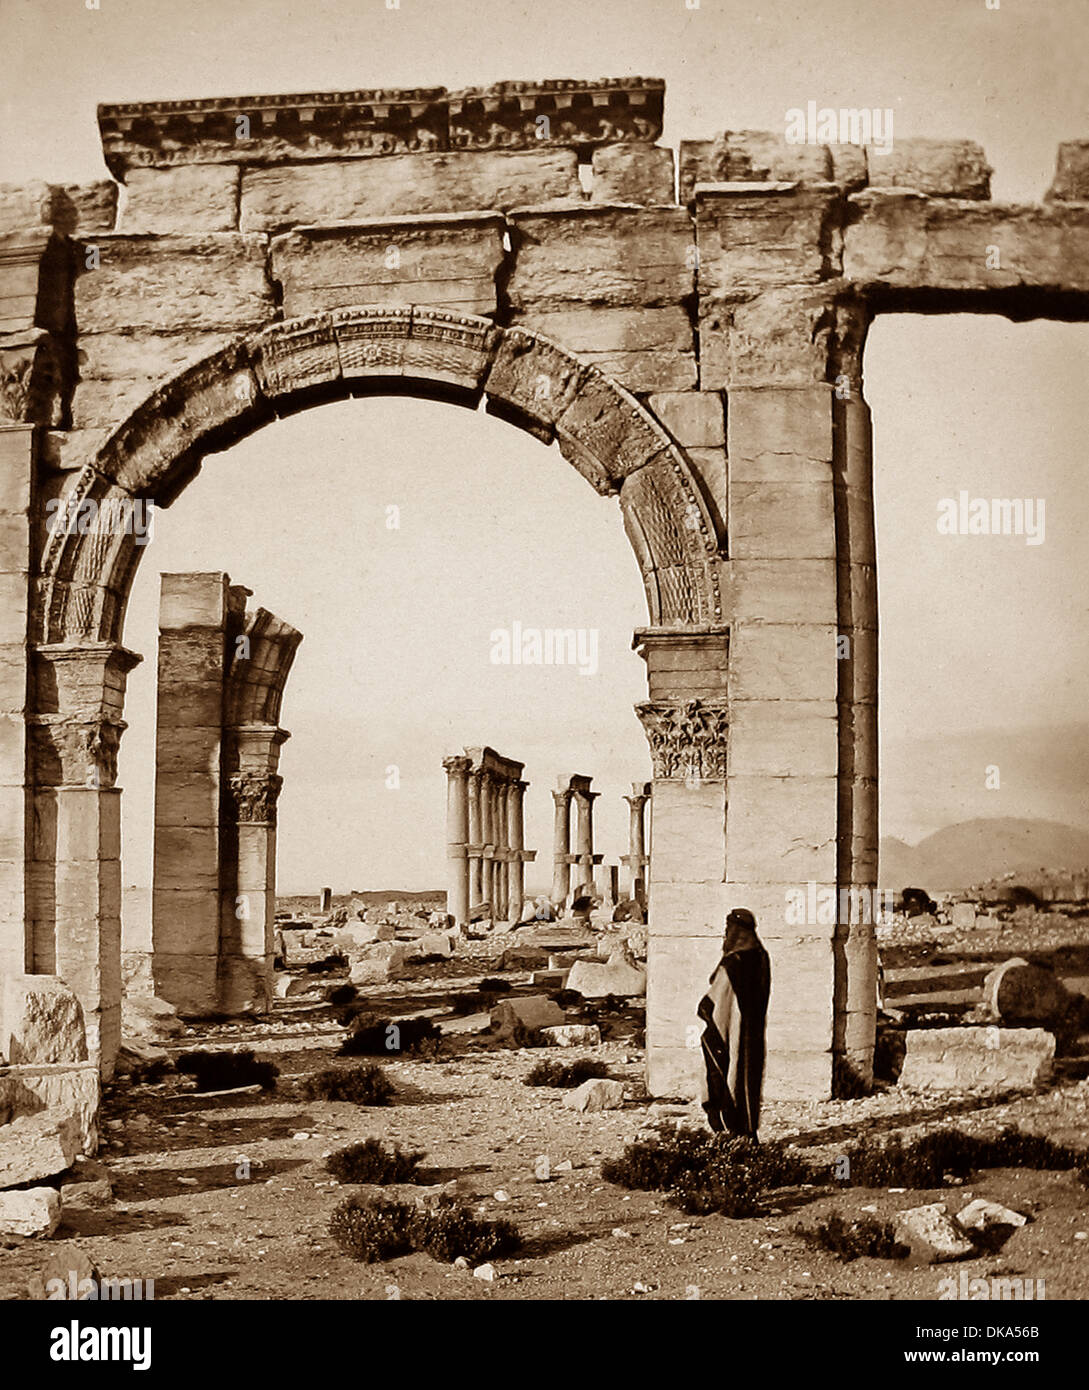 Syria Palmyra pre-1900 - Stock Image